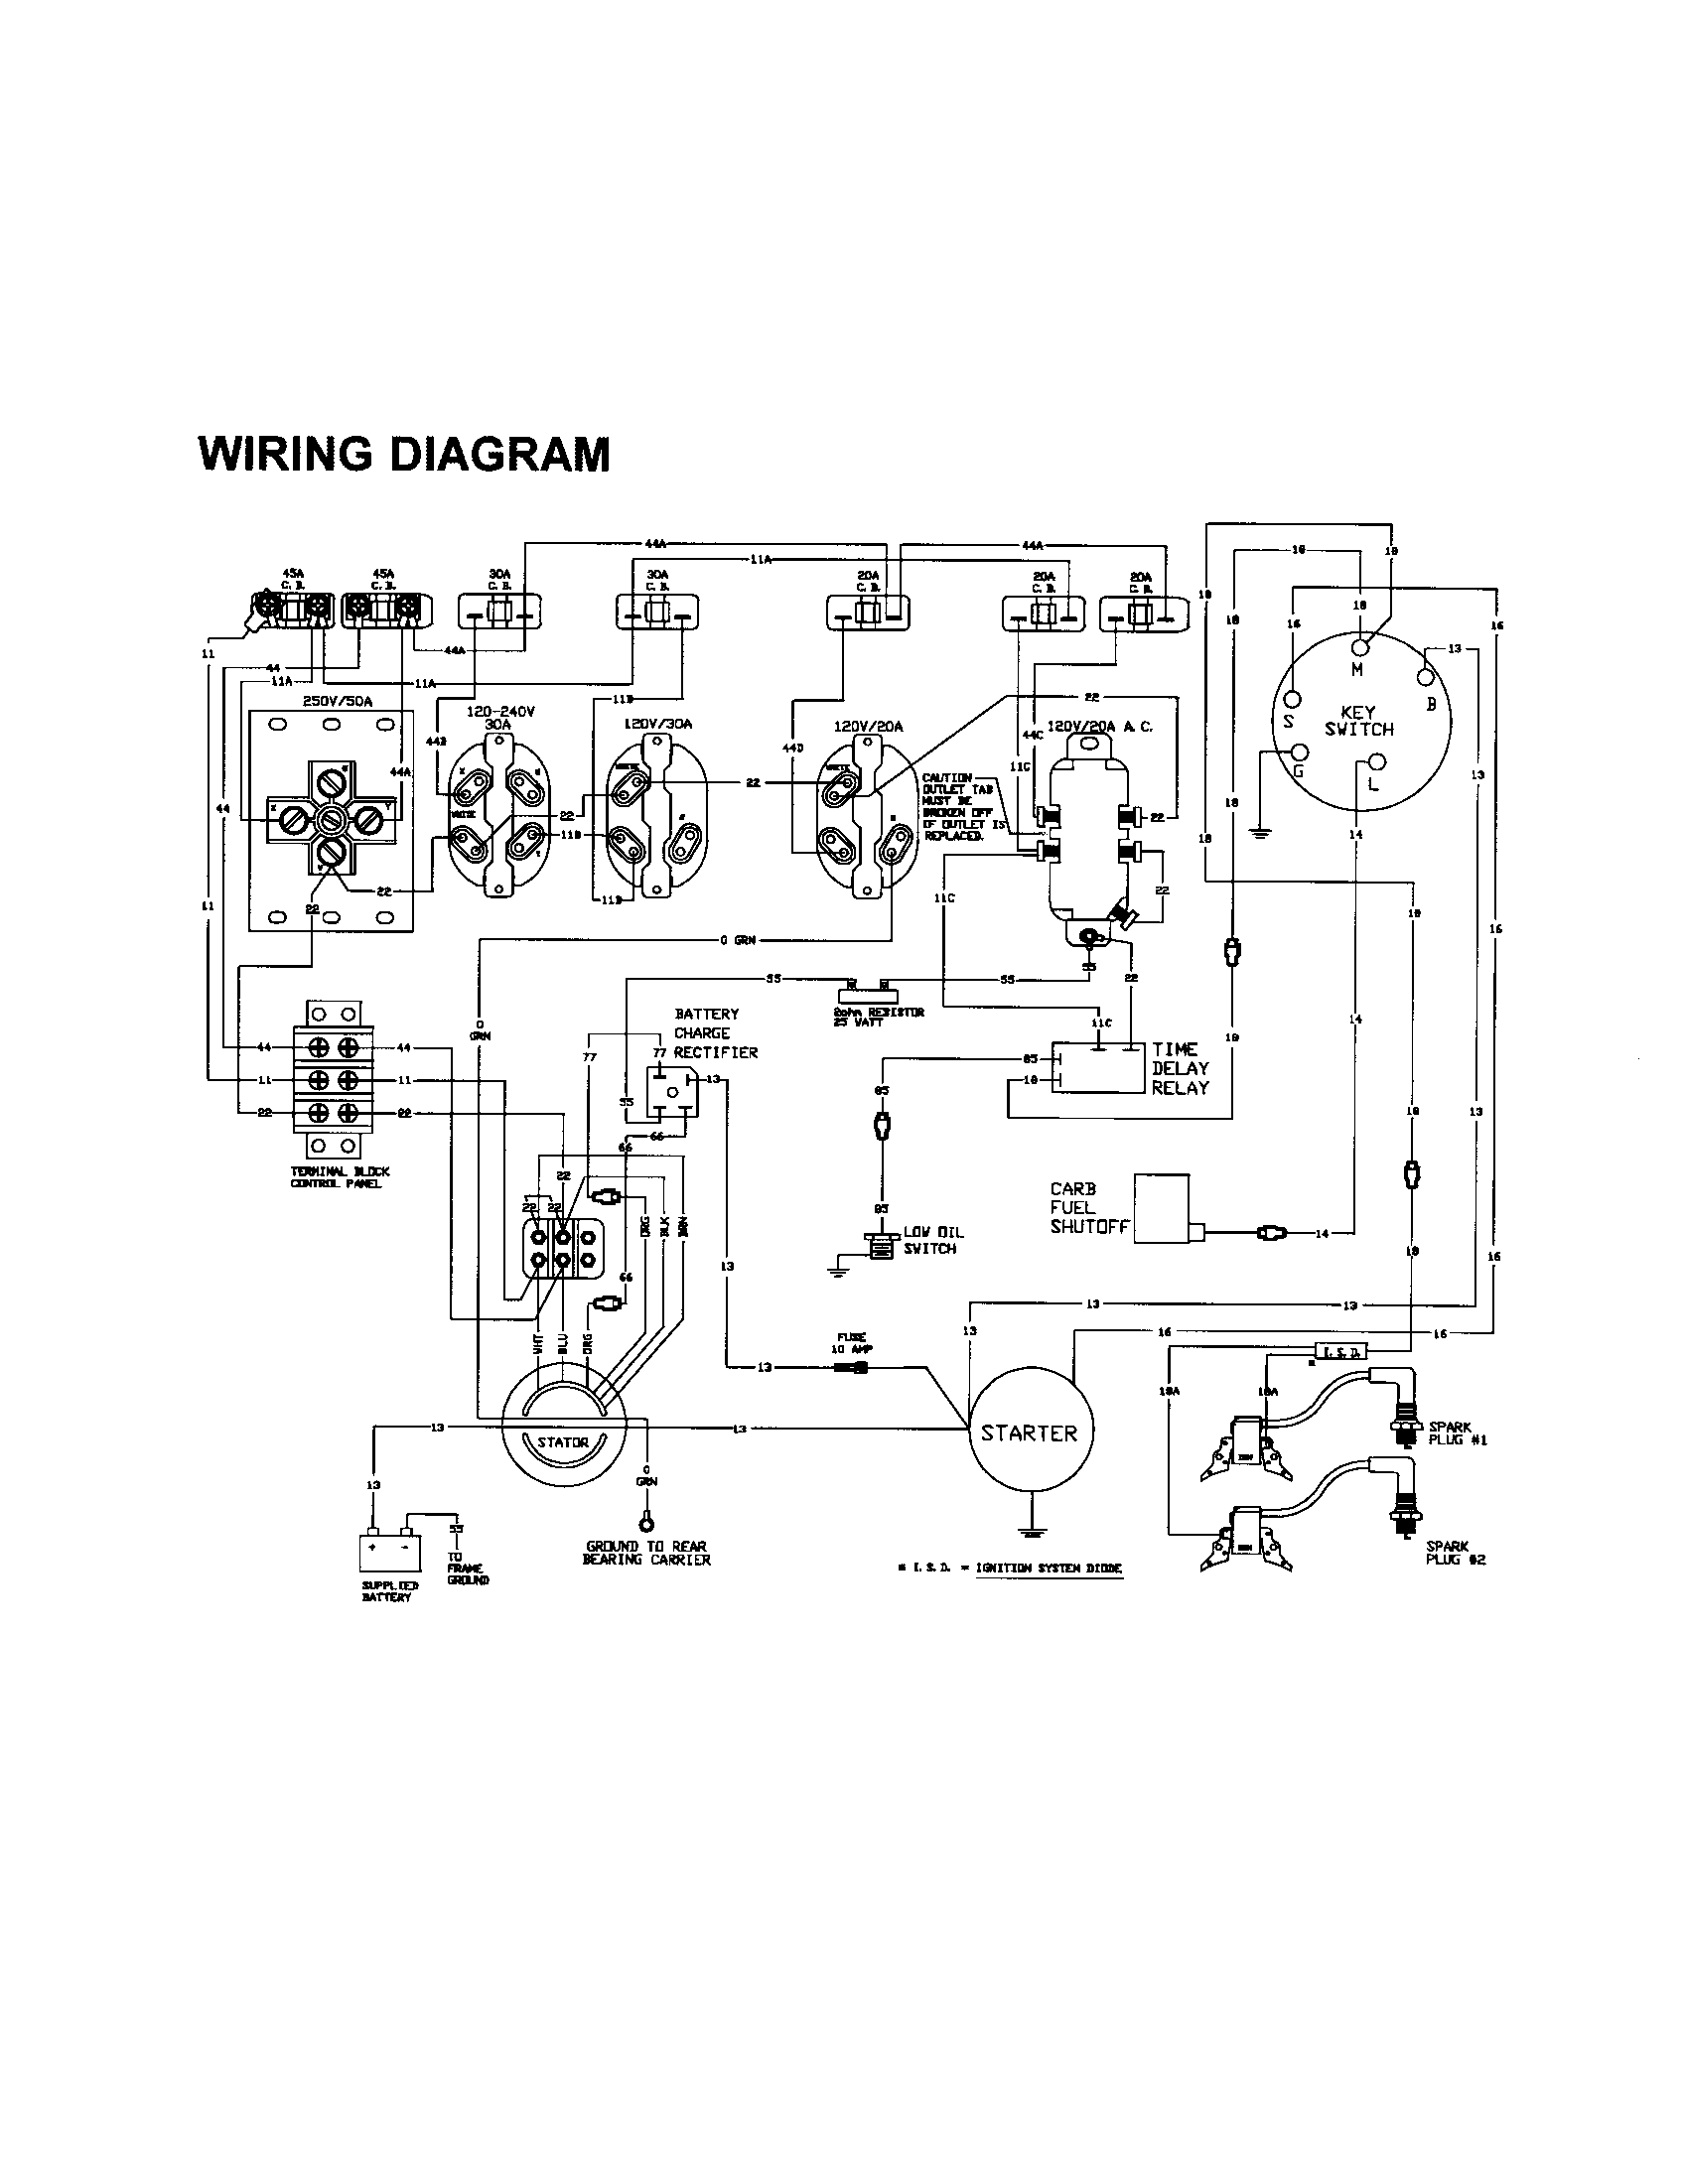 Generac 11kw generator wiring schematic diagrams schematics